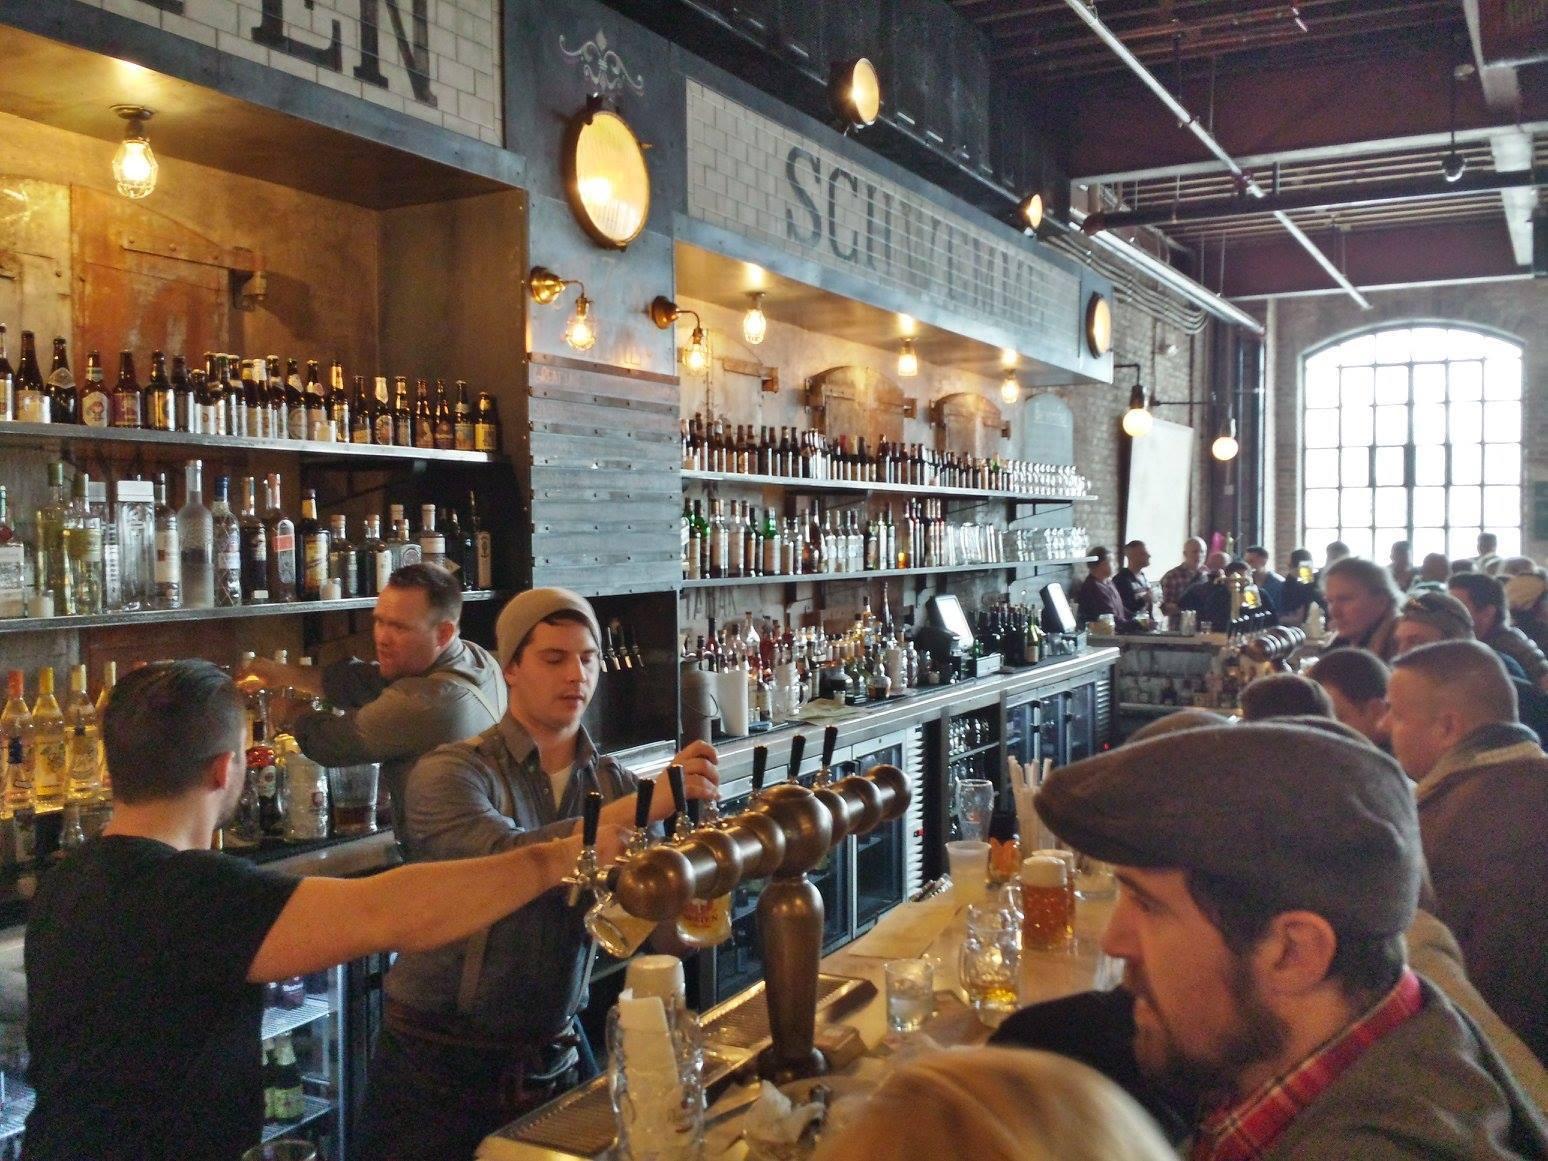 best beer gardens in america 9 favorites cnn travel - Asbury Park Beer Garden